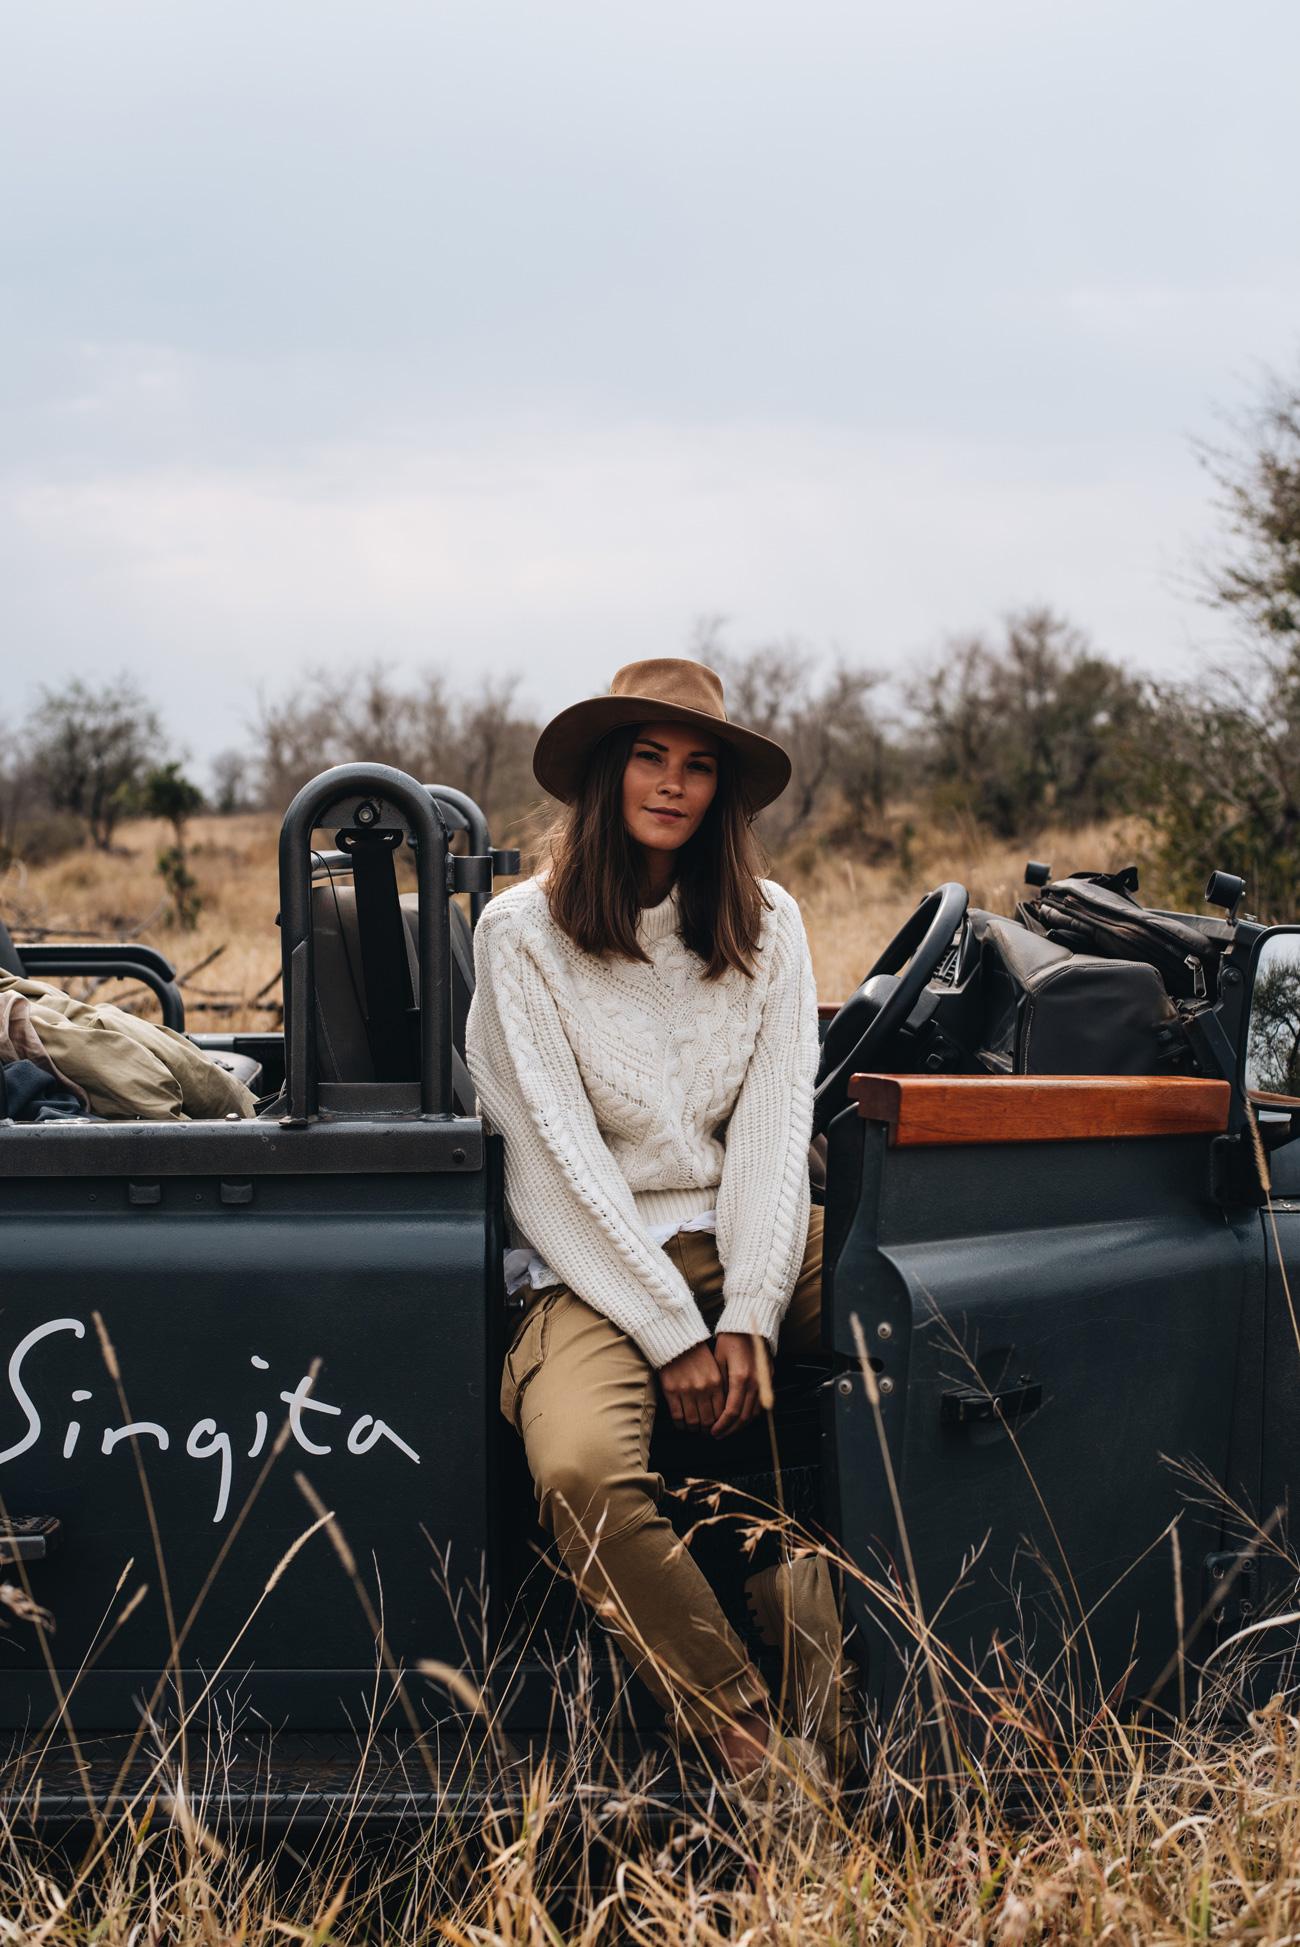 Safari-Südafrika-singita-lodges-krüger-nationalpark-nina-schwichtenberg-fashiioncarpet